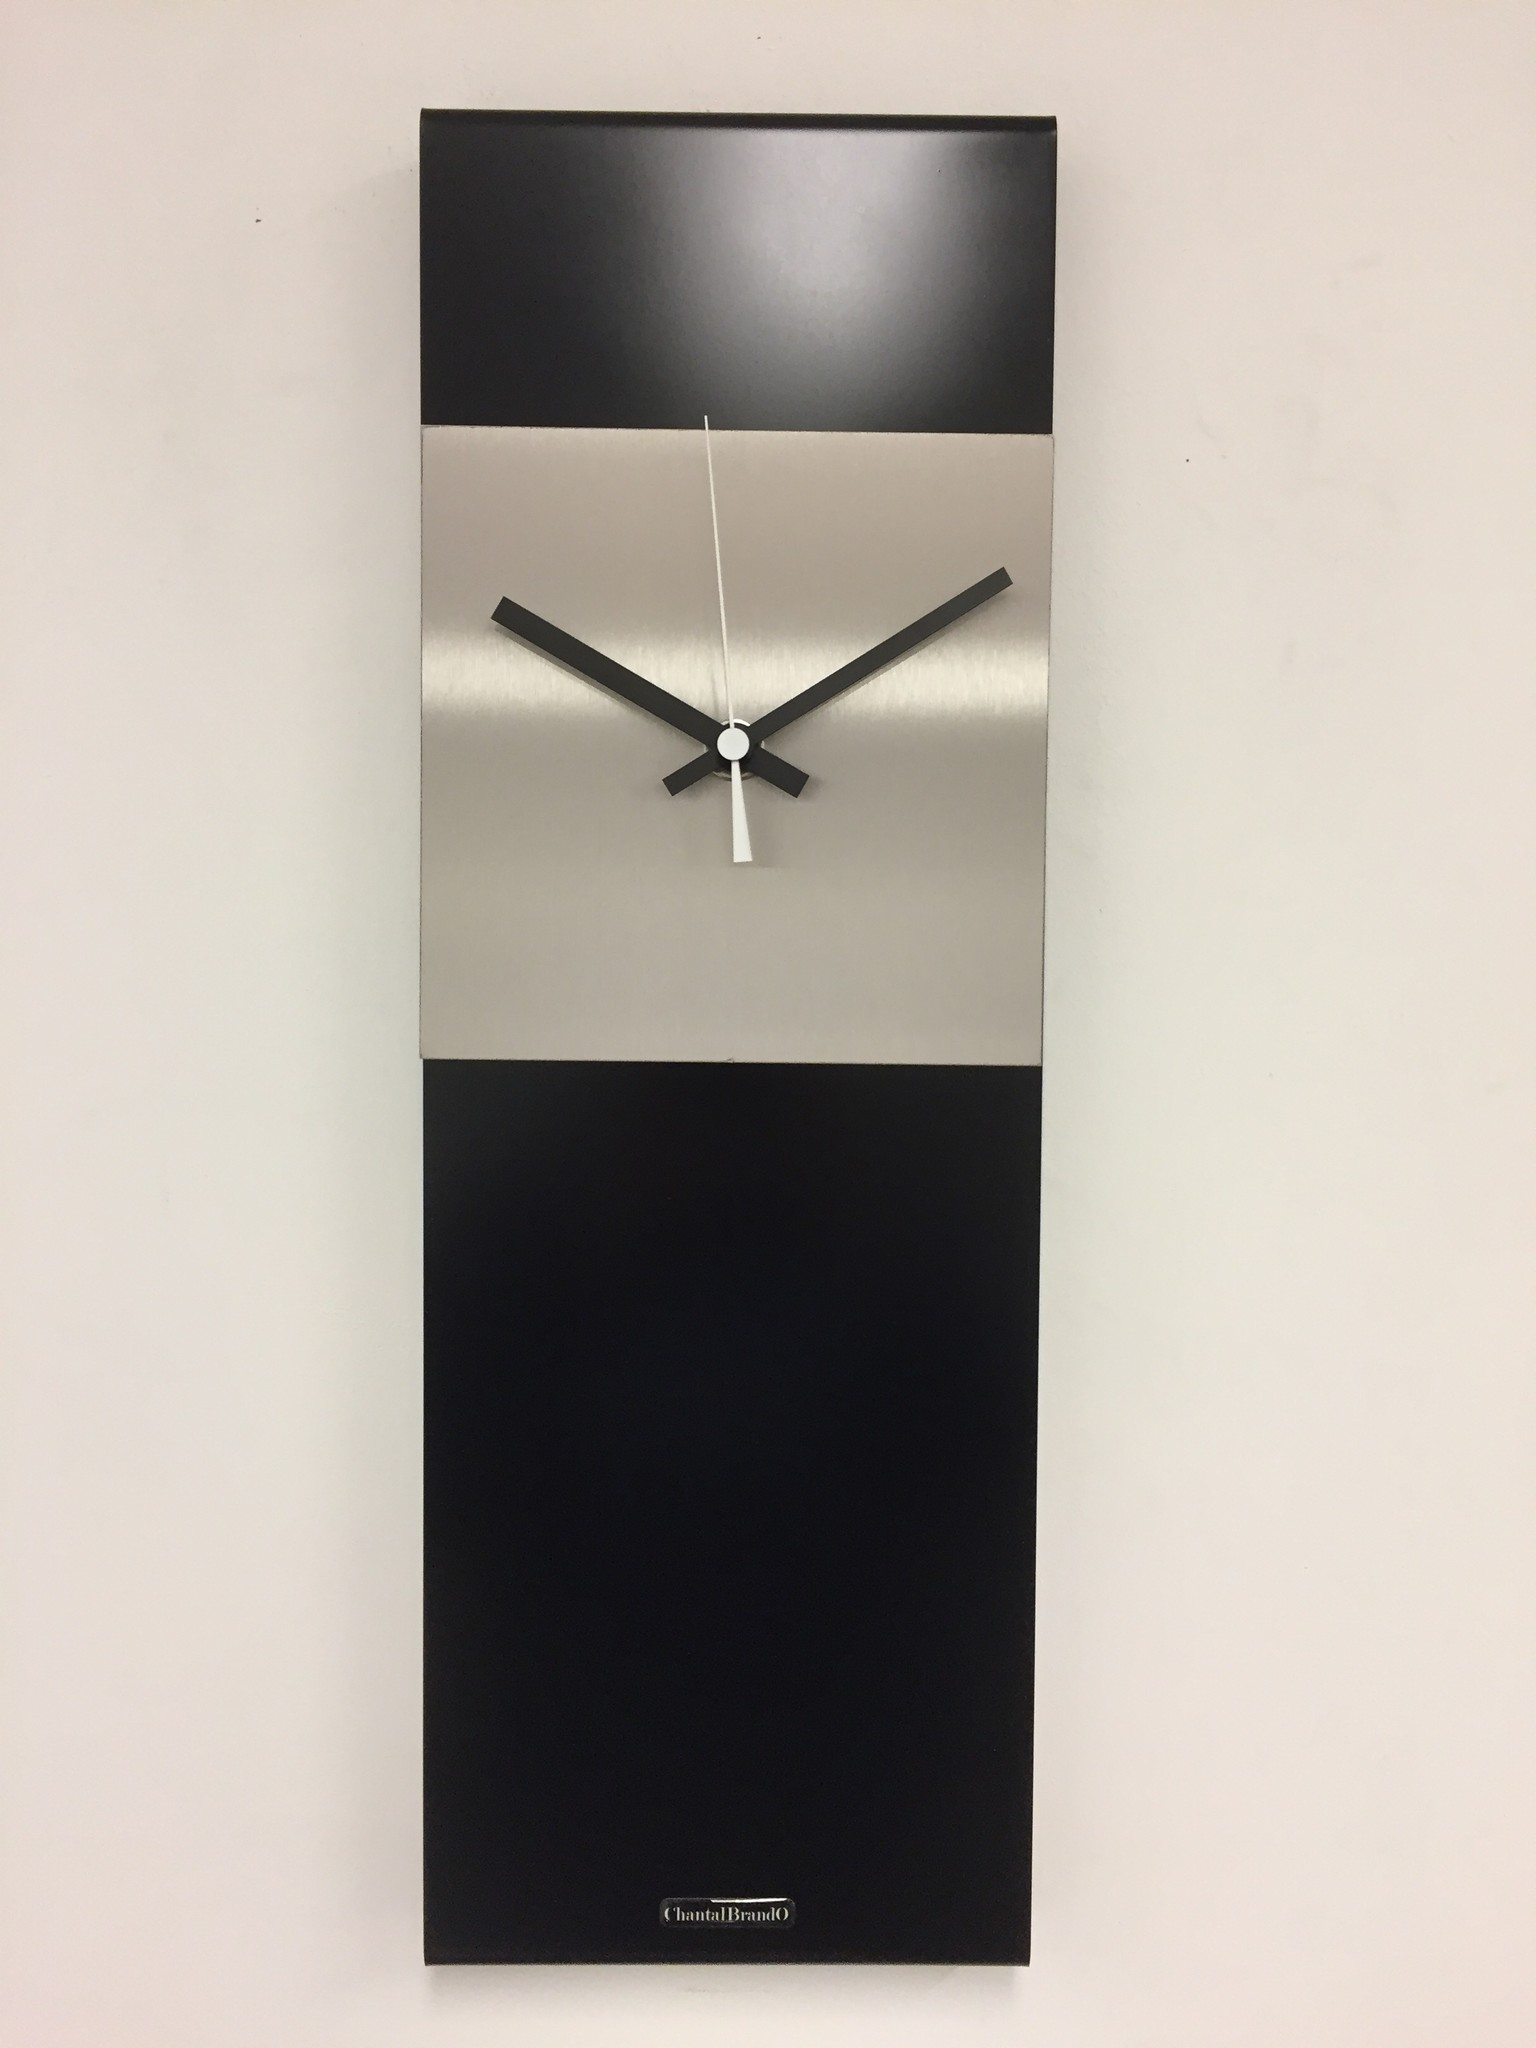 ChantalBrandO Wandklok LaBrand Export Design Black & White Pointer Modern Dutch Design